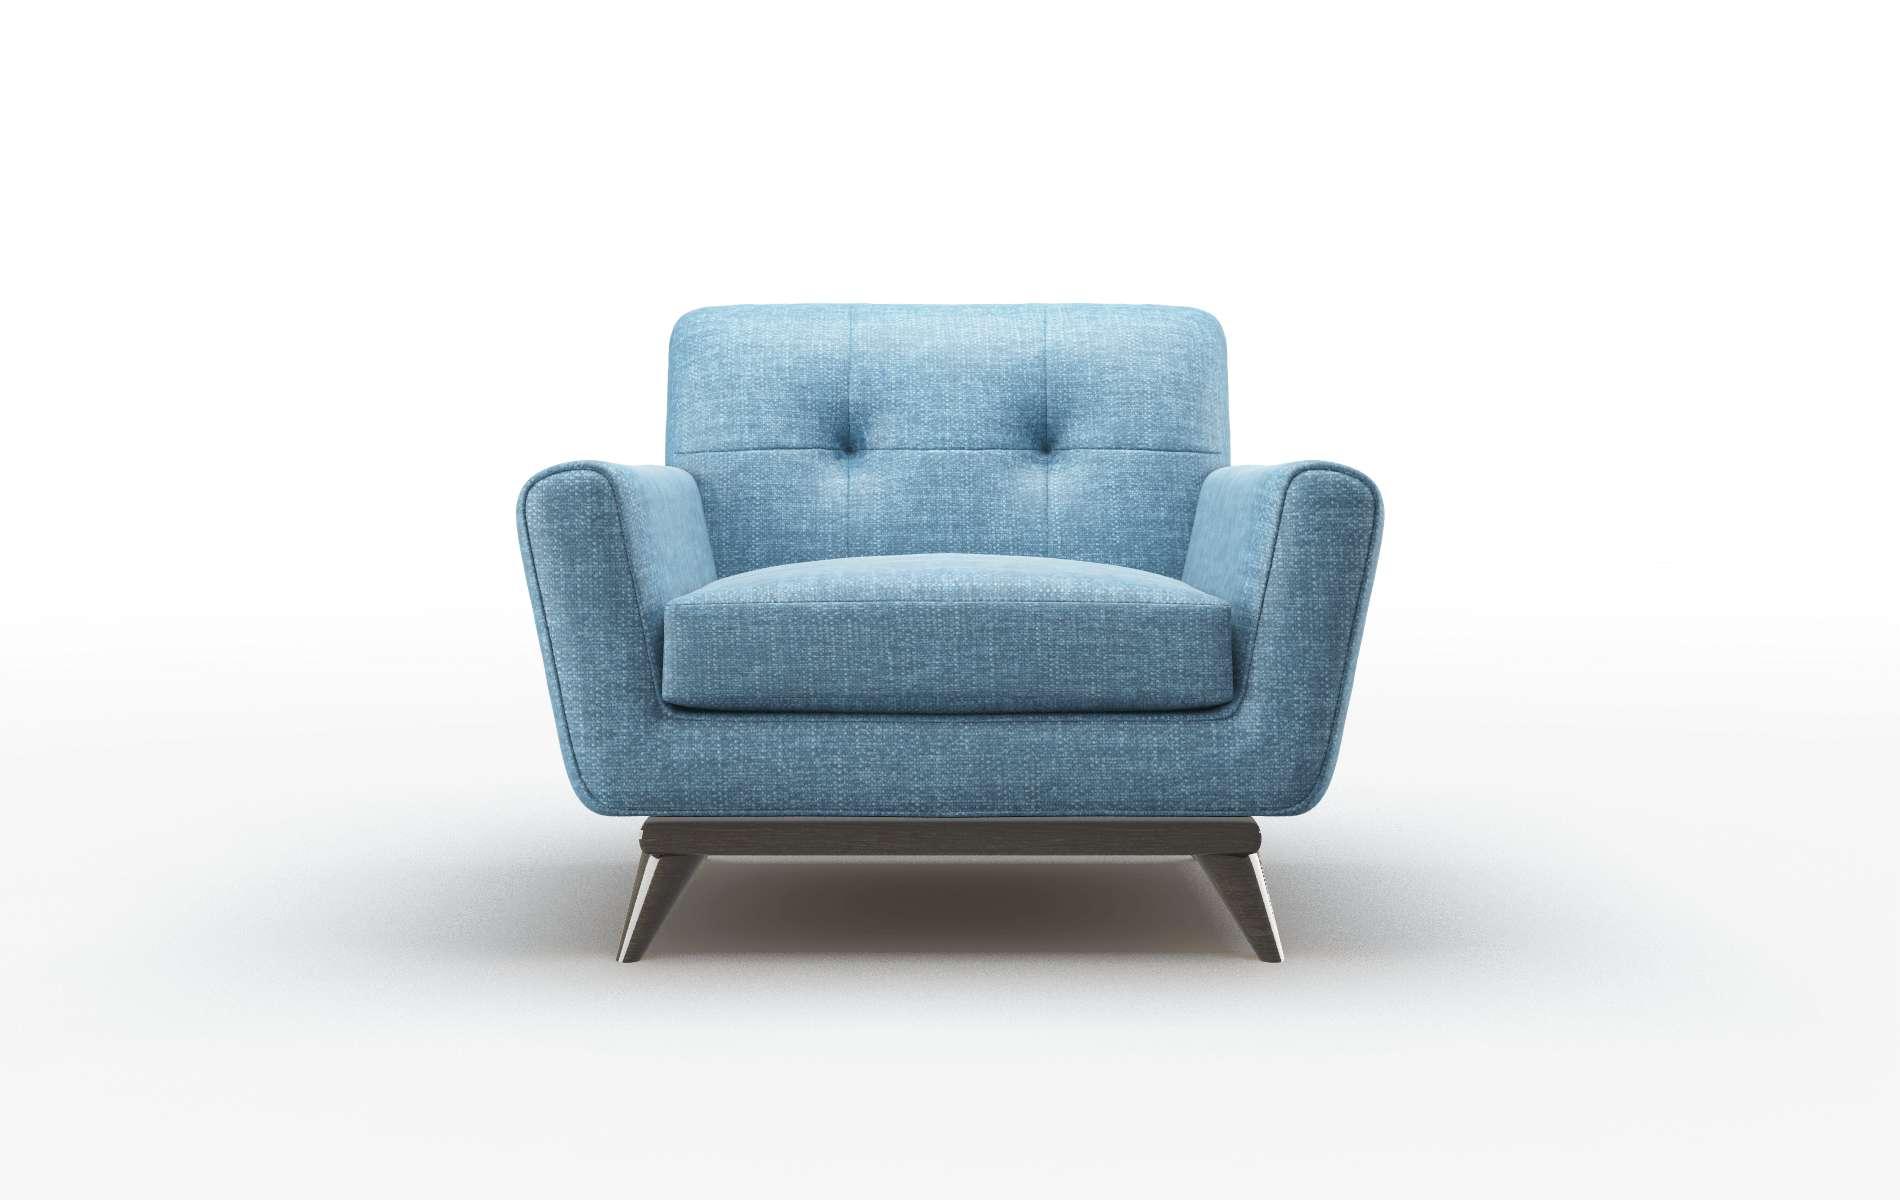 Brussels Keylargo Ocean Chair espresso legs 1